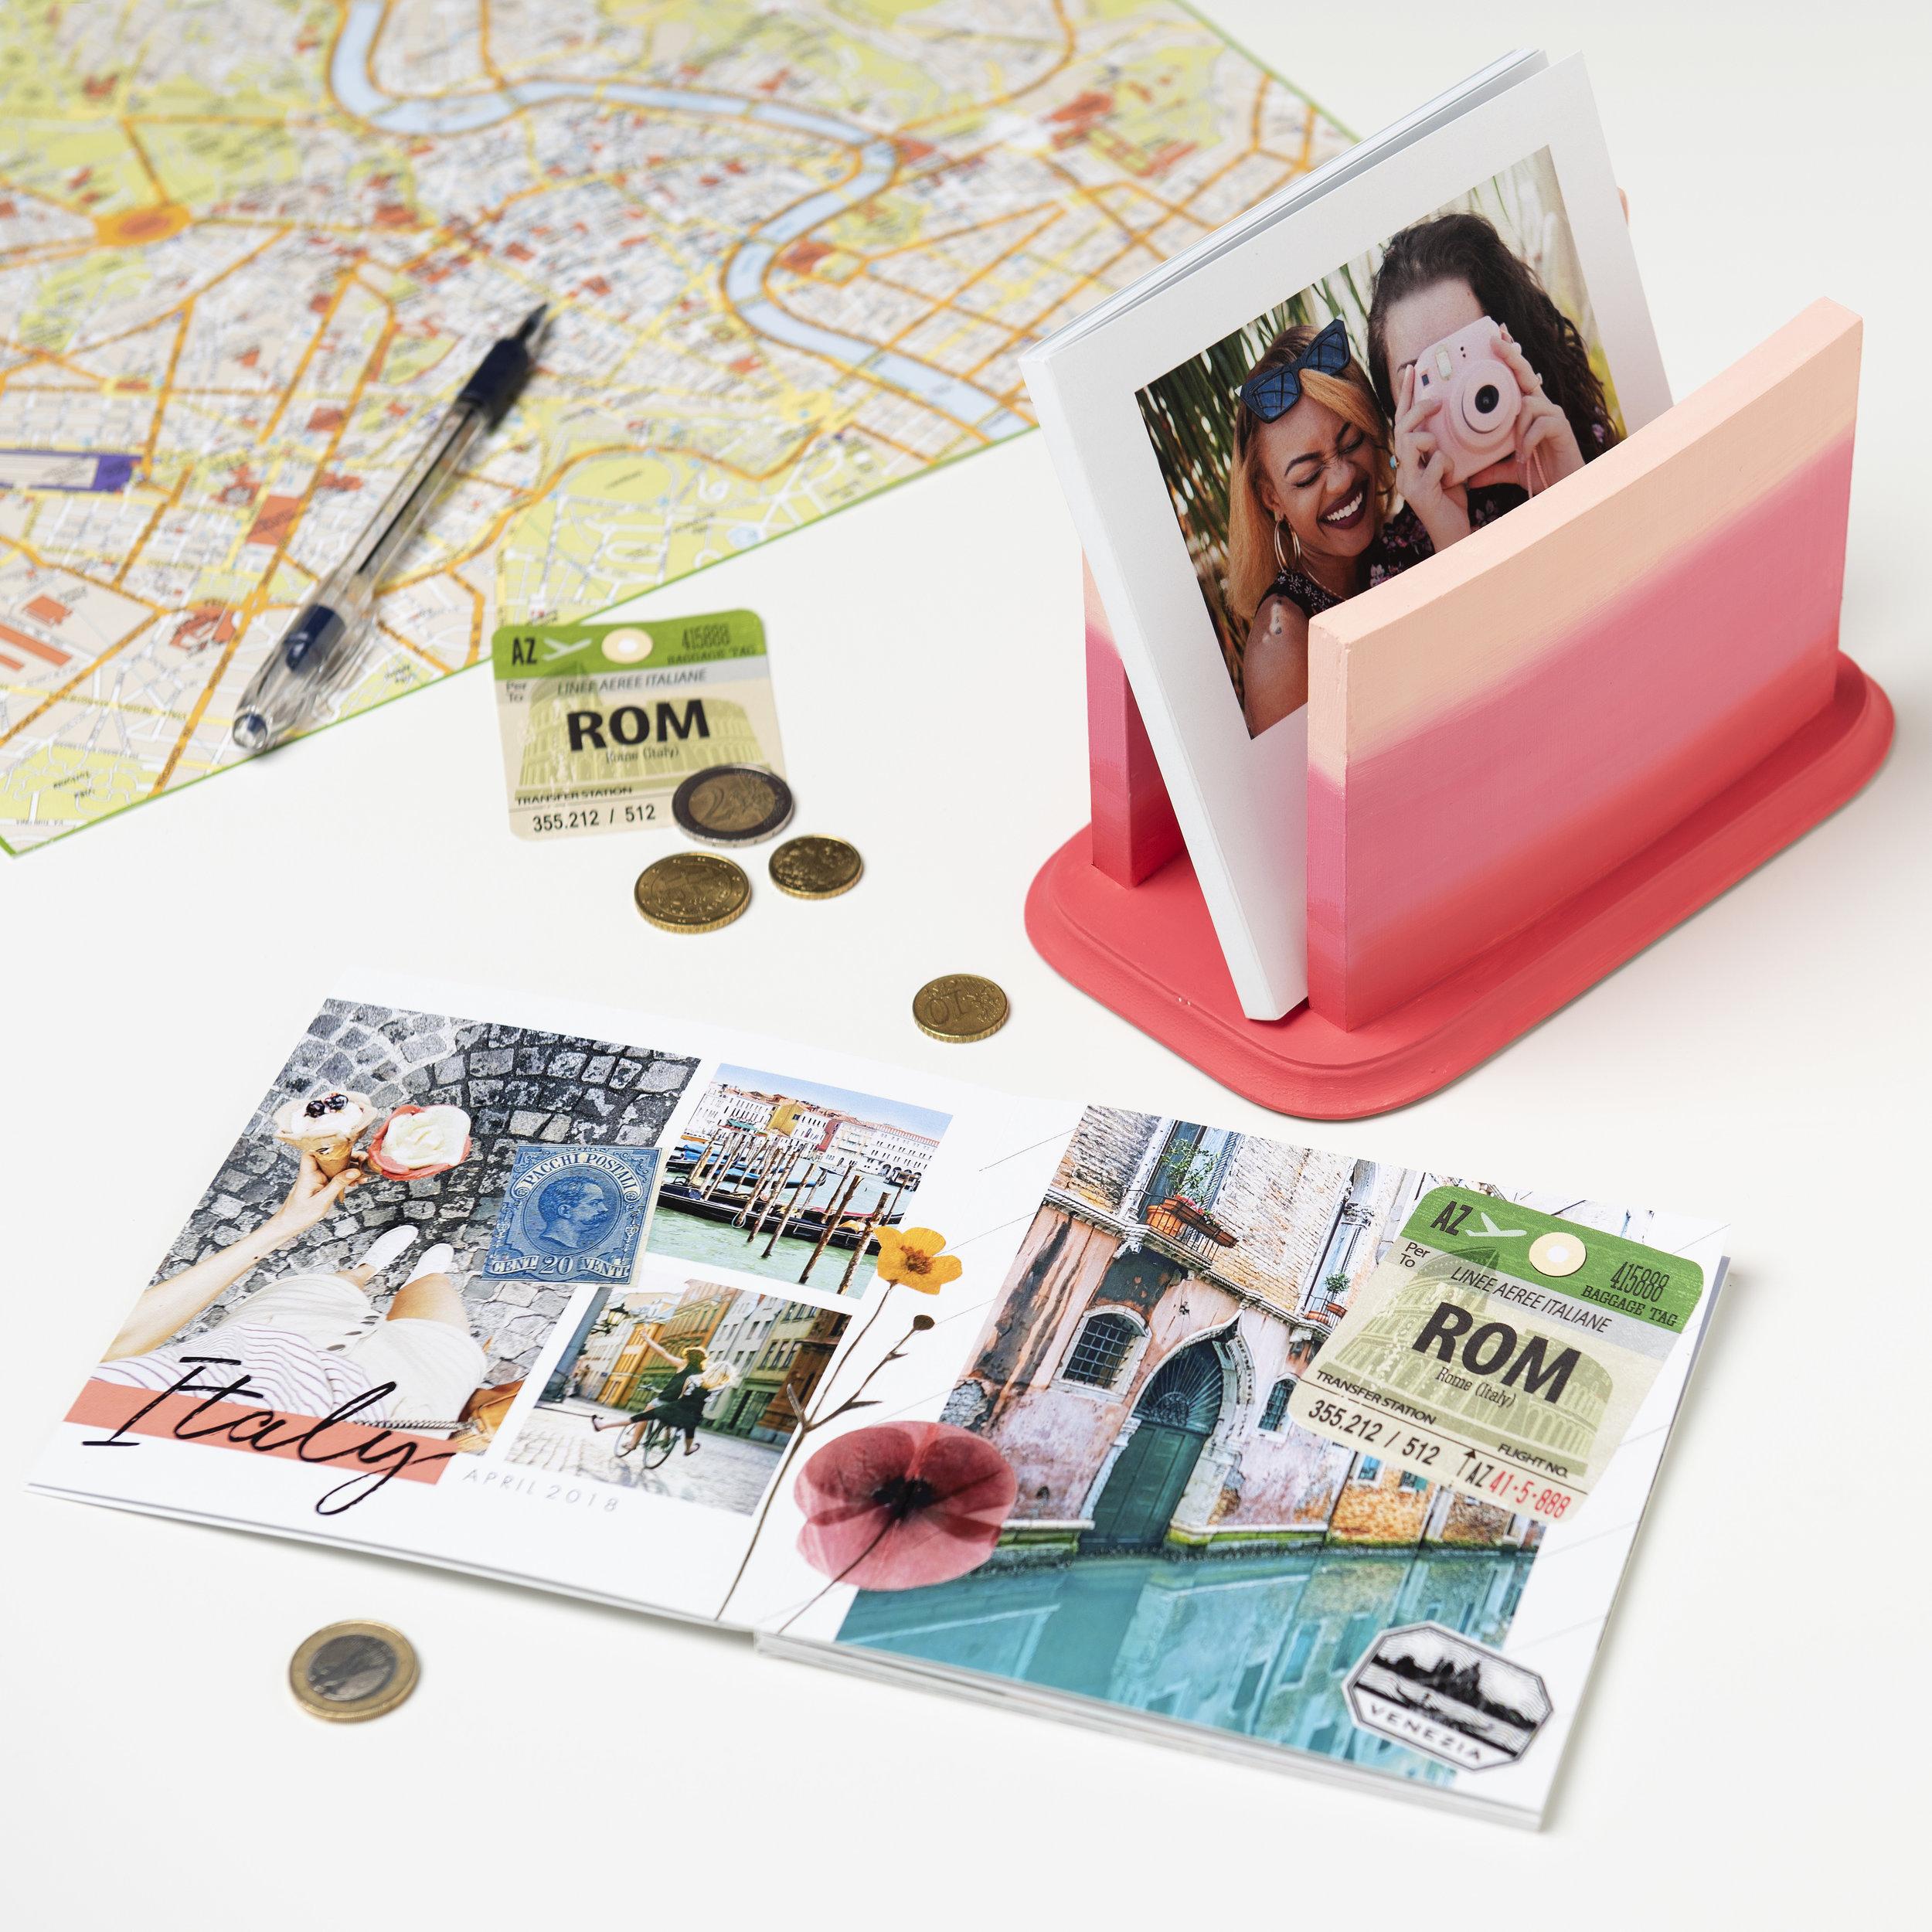 travel-photo-book-mixbook-plaid-crafts-diy.jpg